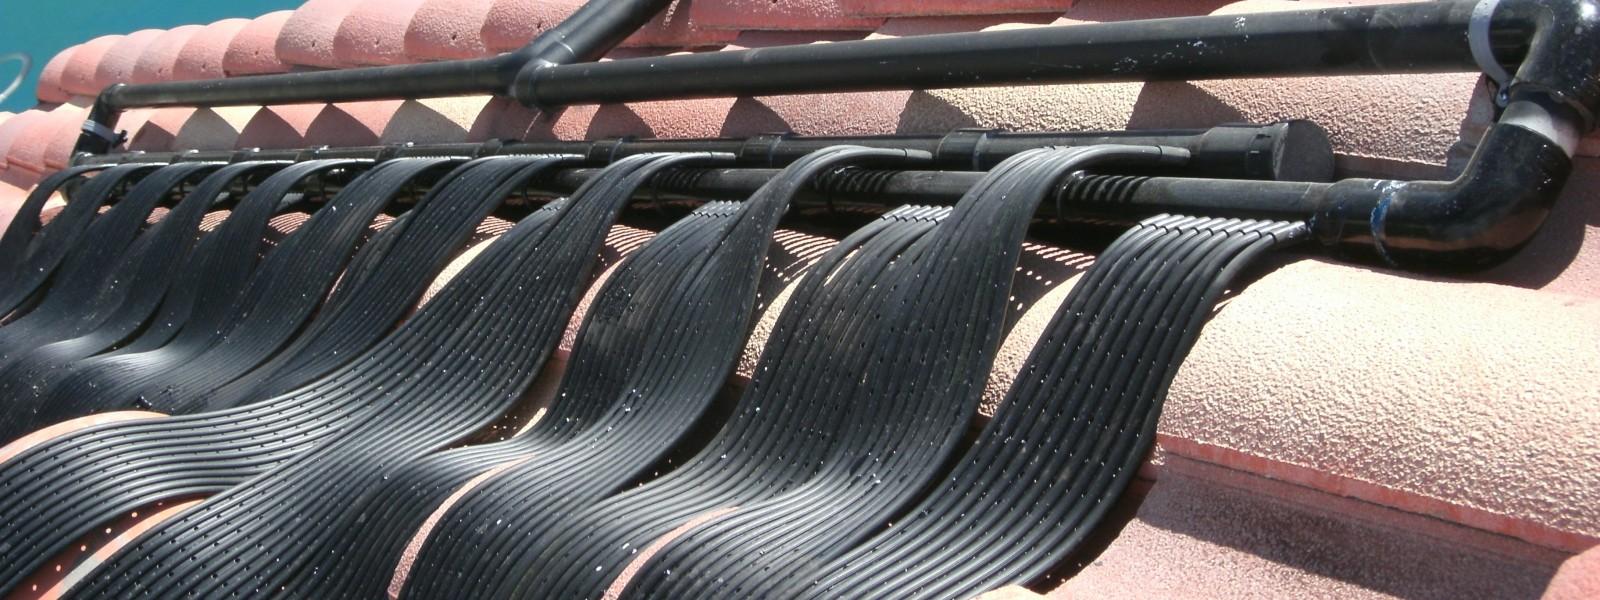 All black solar heaters